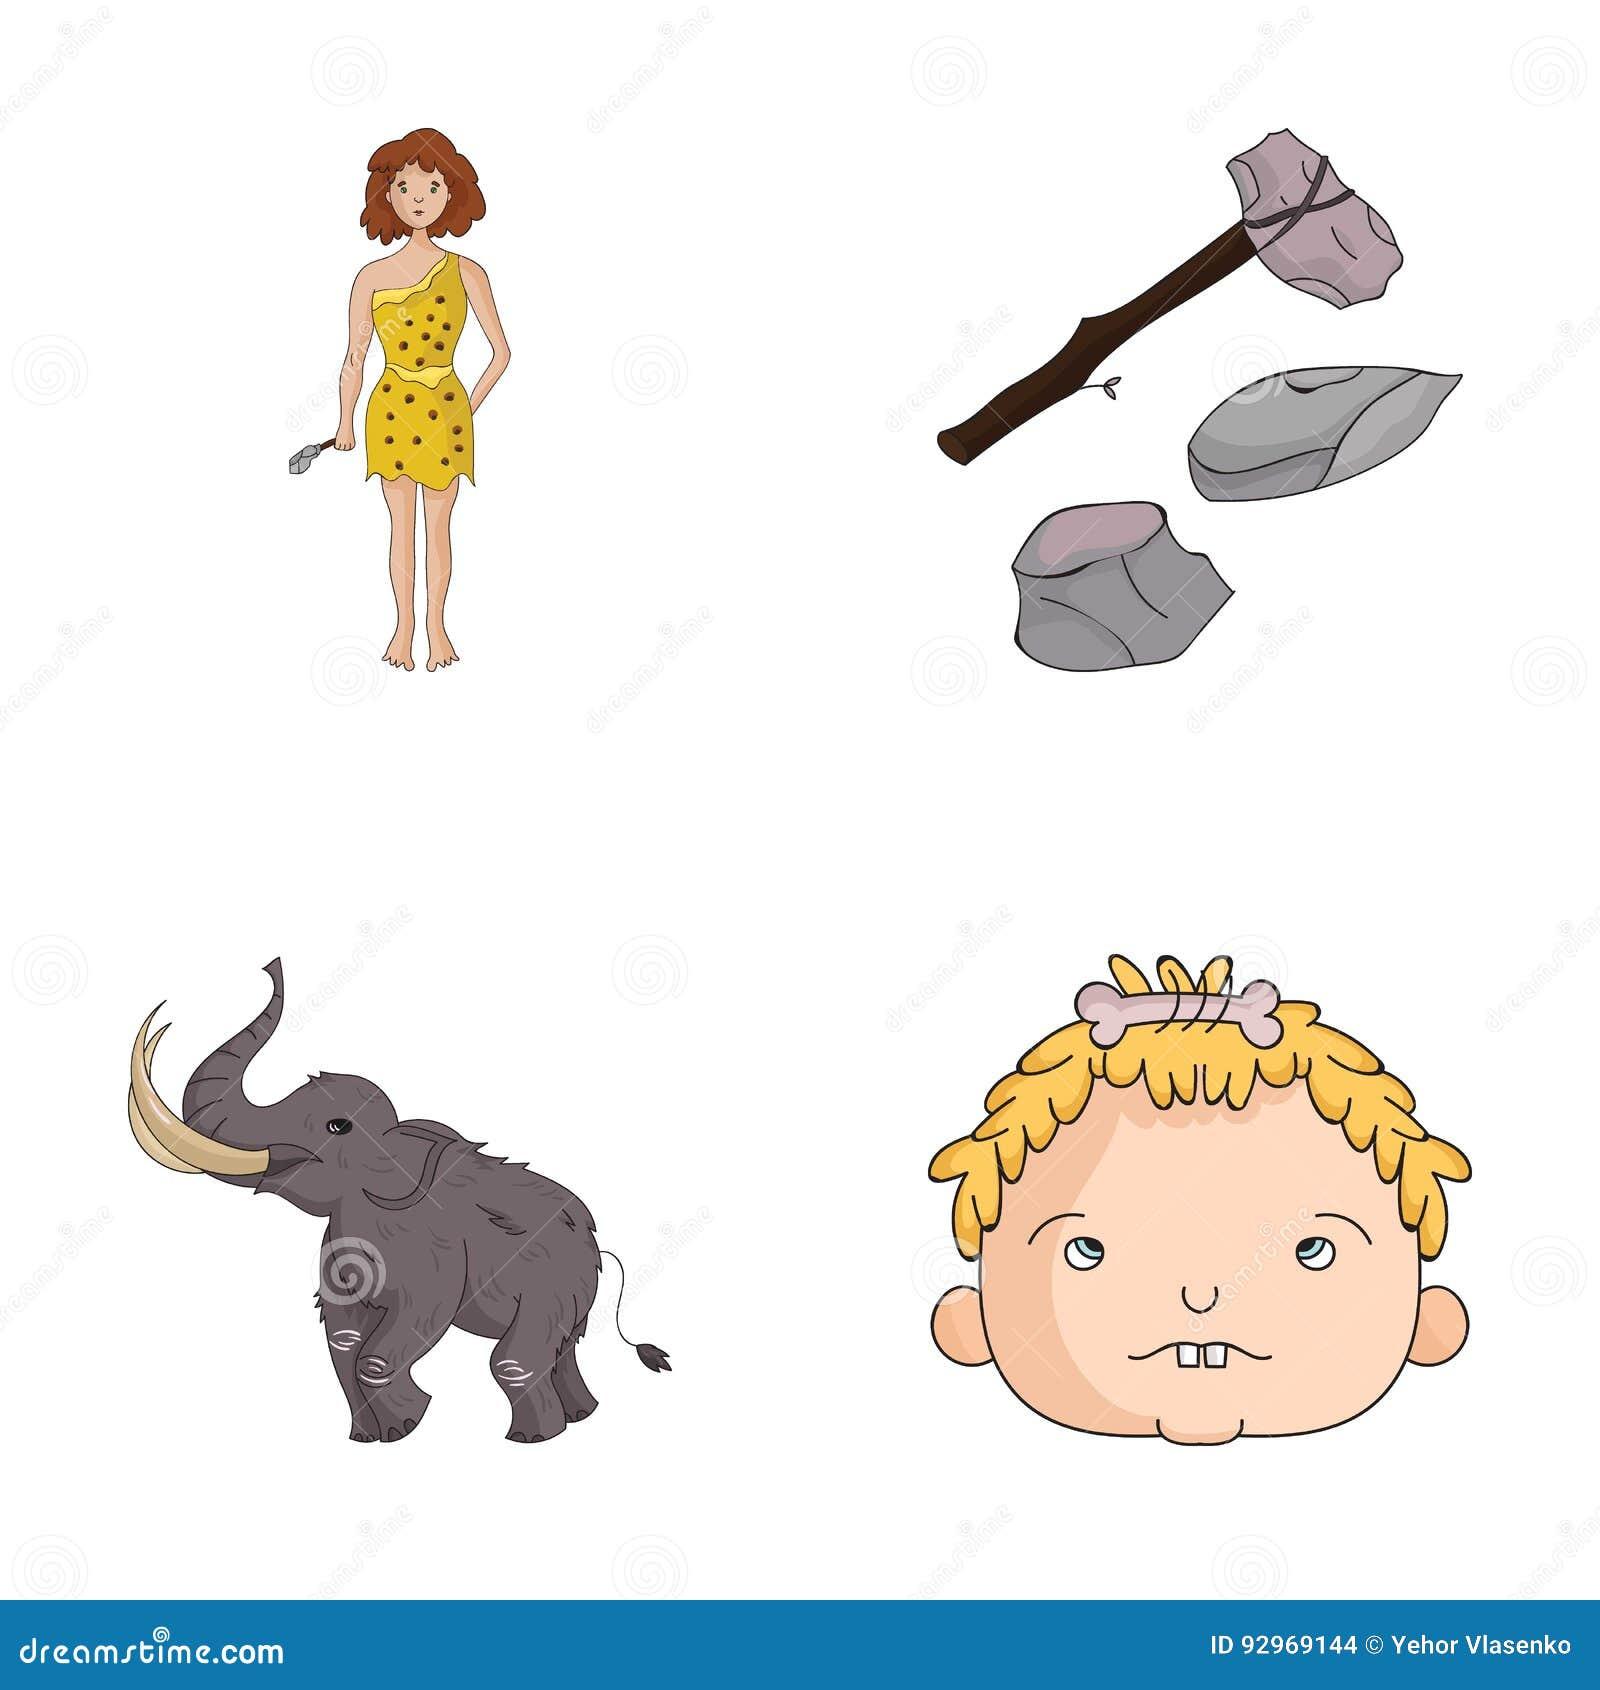 Caveman Hammer : Stone age hammer cartoon pixshark images